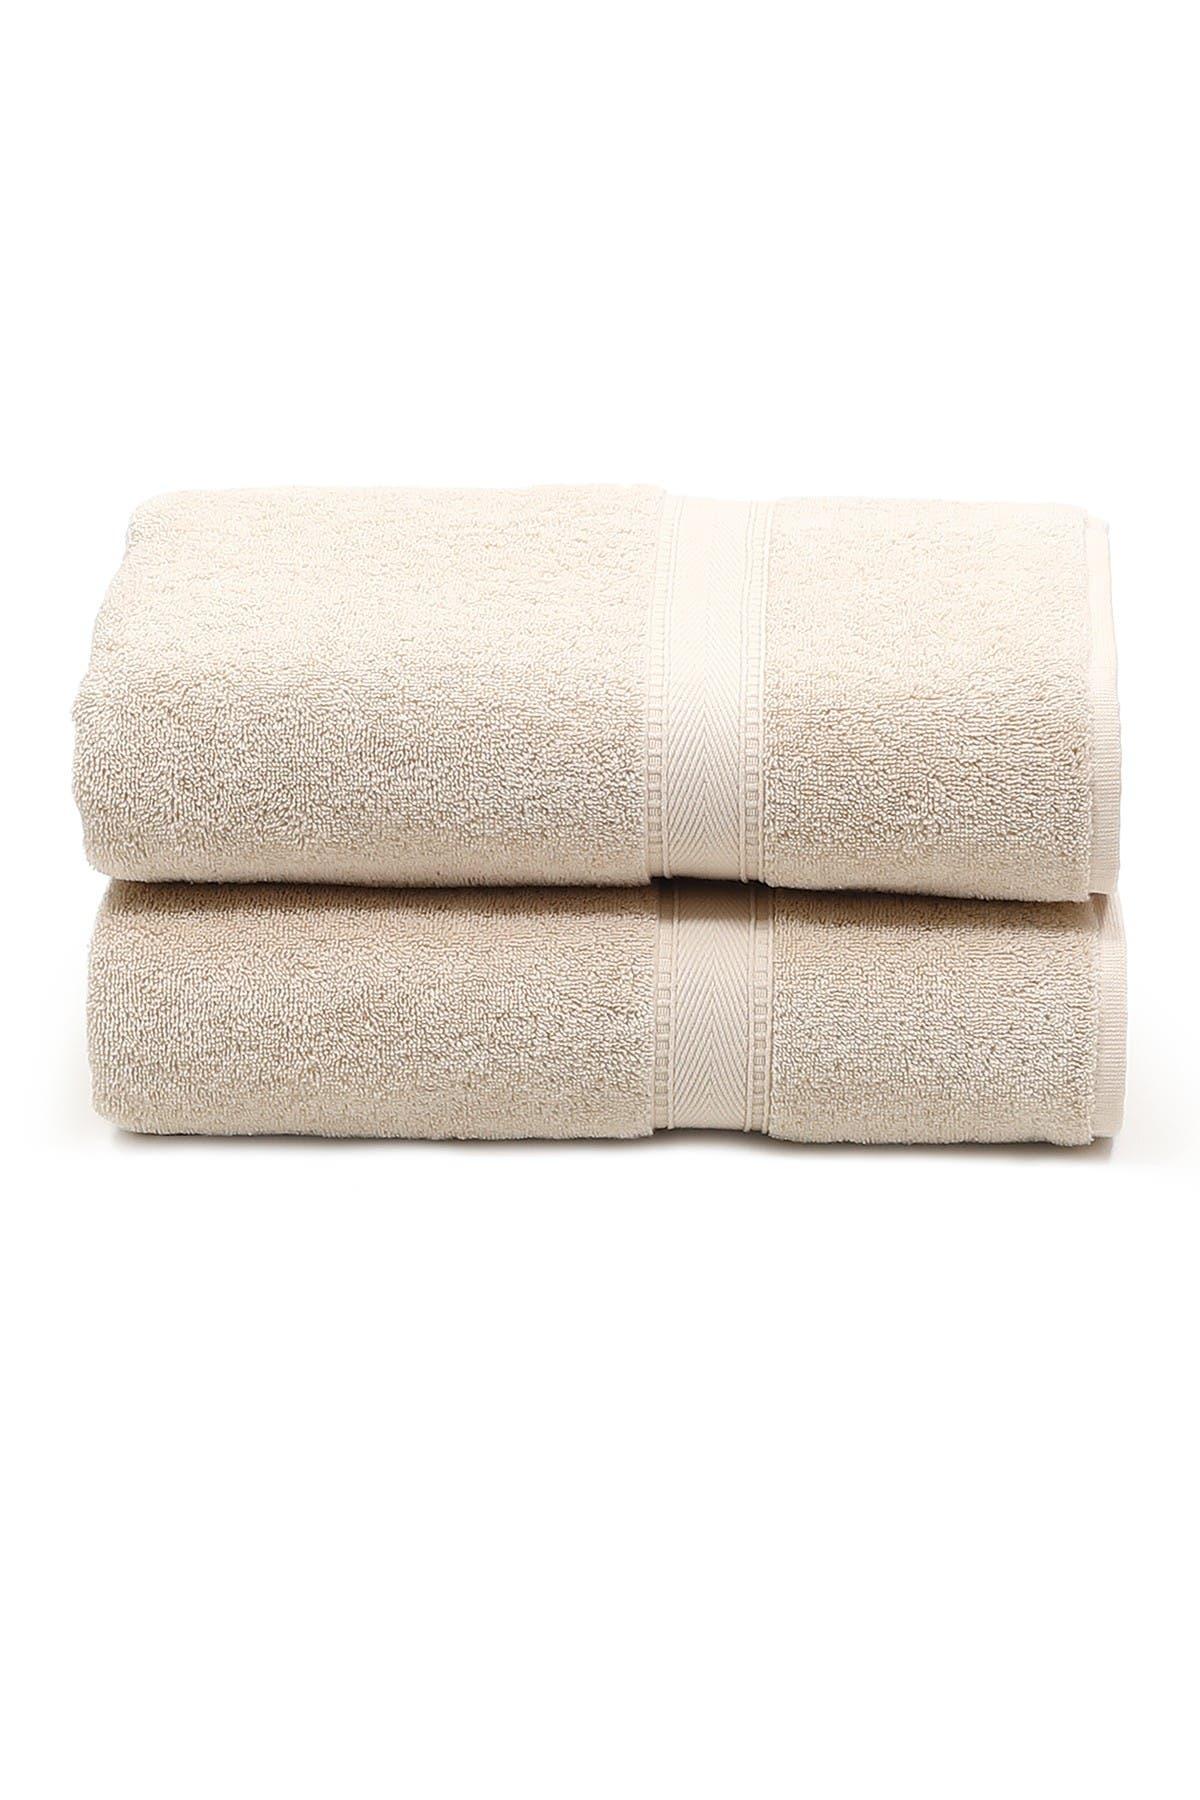 Image of LINUM HOME Sinemis Terry Bath Towels - Set of 2 - Beige